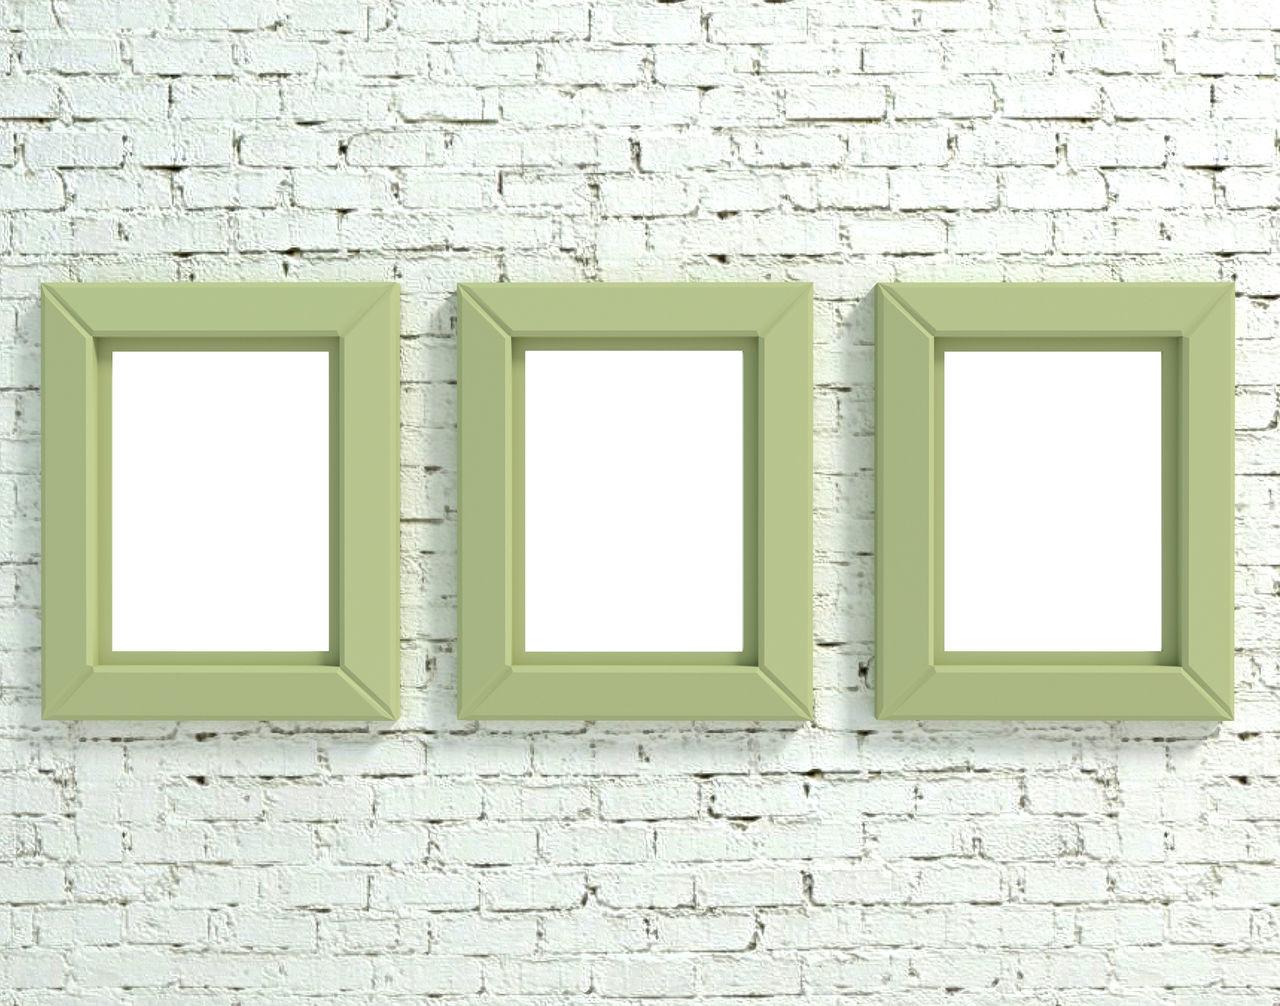 Beautiful stock photos of frame, Art, Art And Craft, Brick Wall, Copy Space